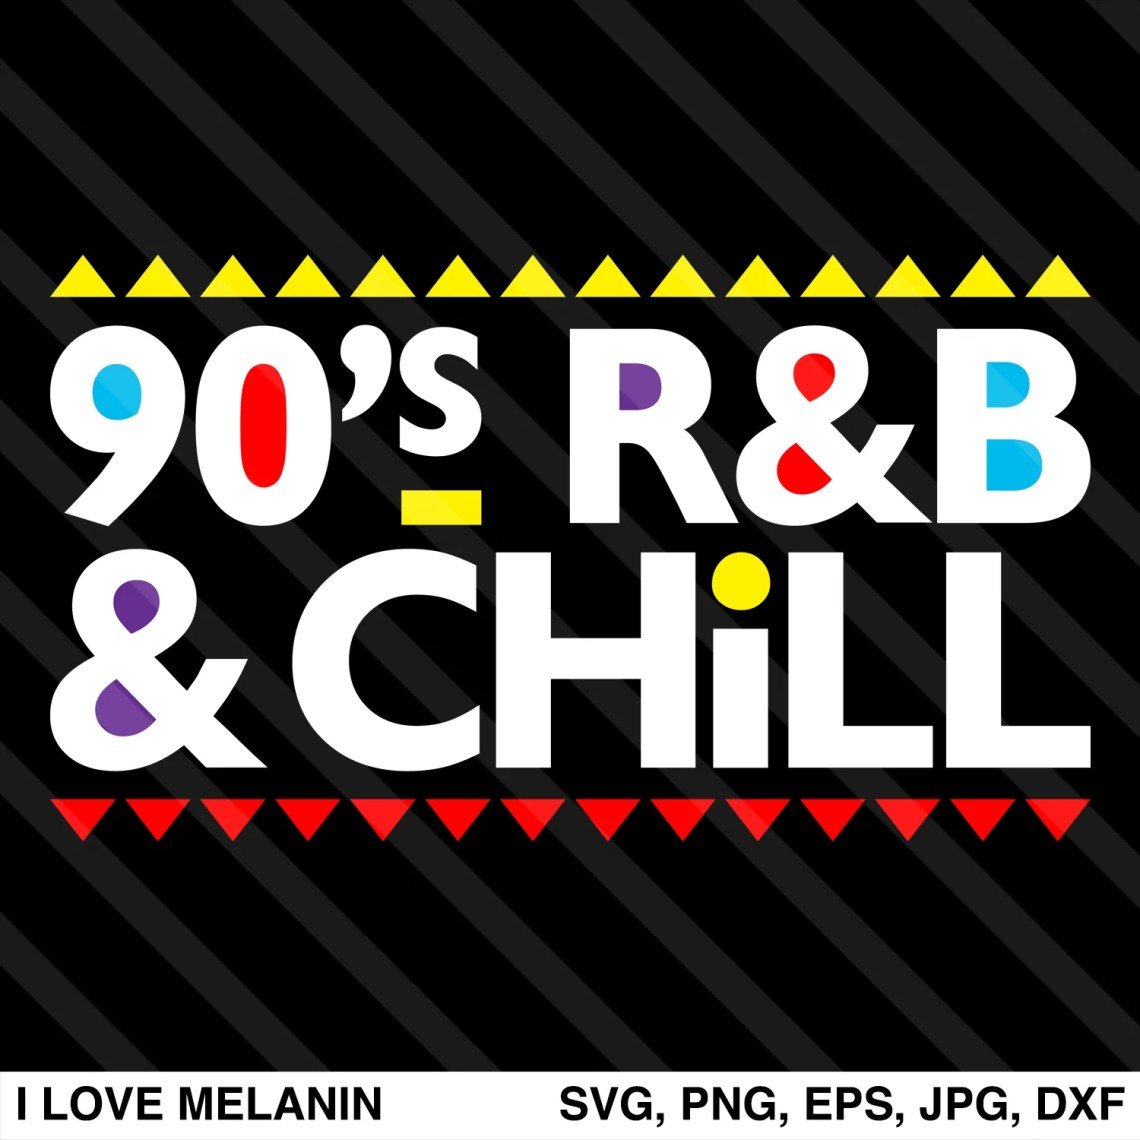 Download 90's R&B & Chill SVG - I Love Melanin